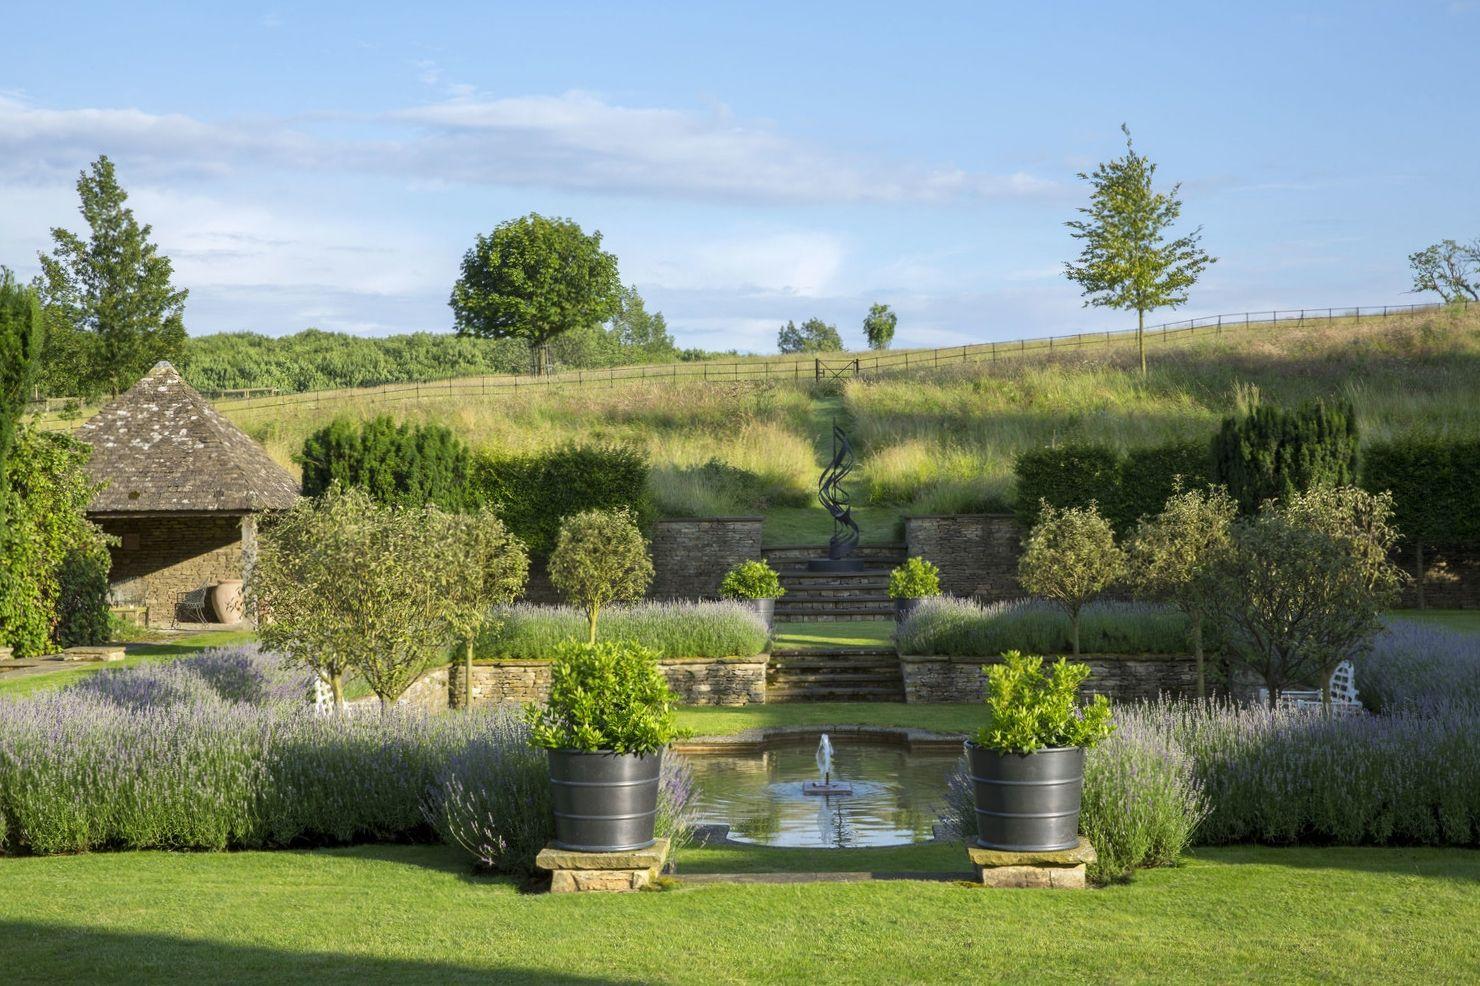 graham lloyd-brunt garden design   Beautiful Landscapes ... on Backyard Landscape Designers Near Me id=80968